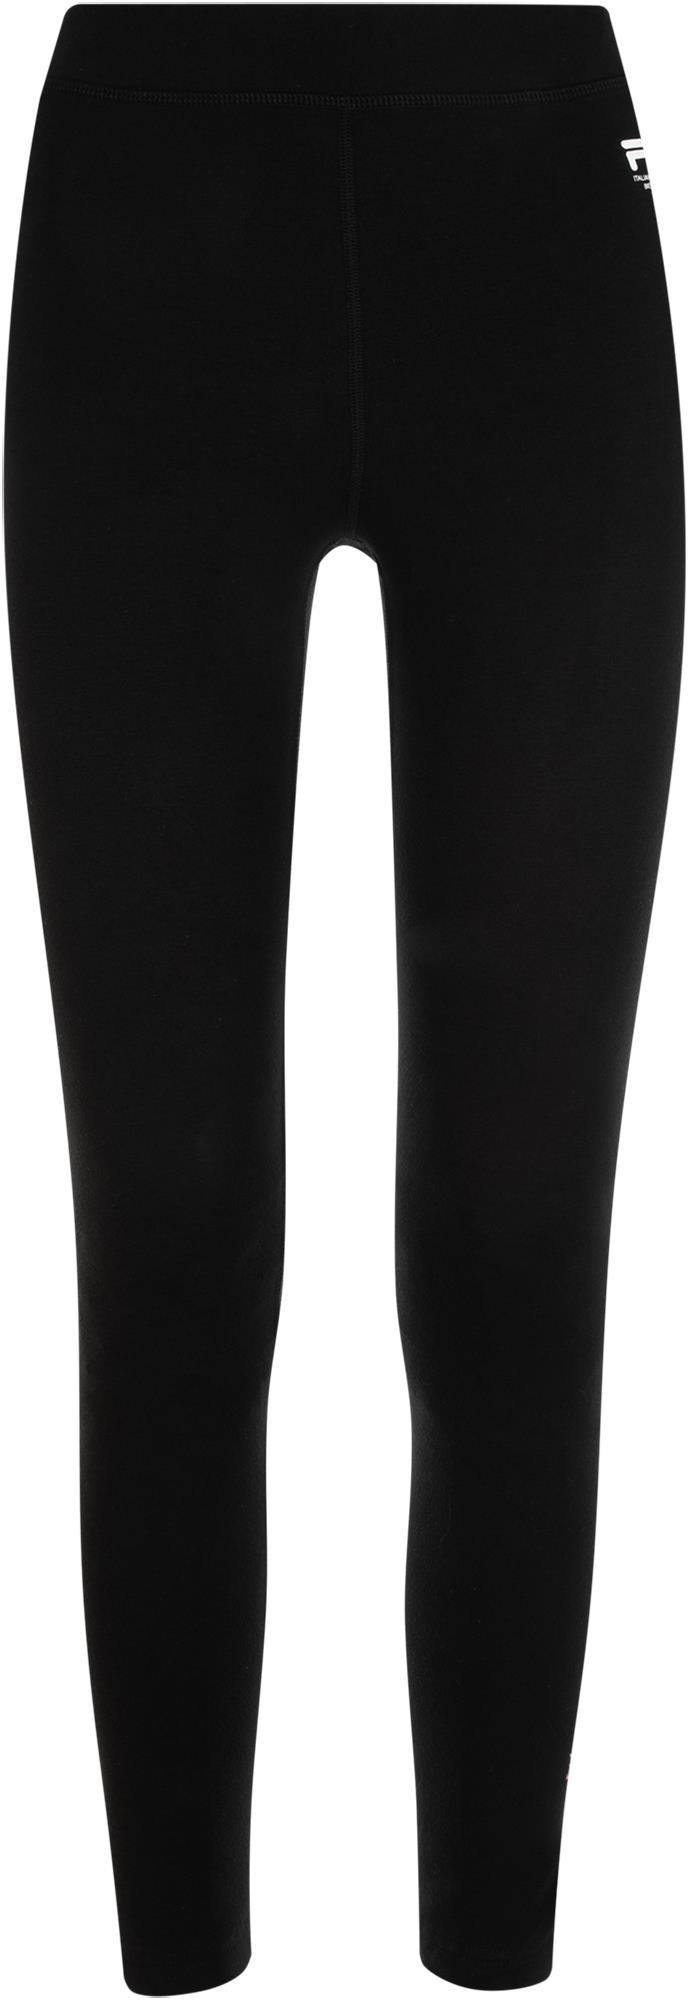 Леггинсы Fila Womens Leggings